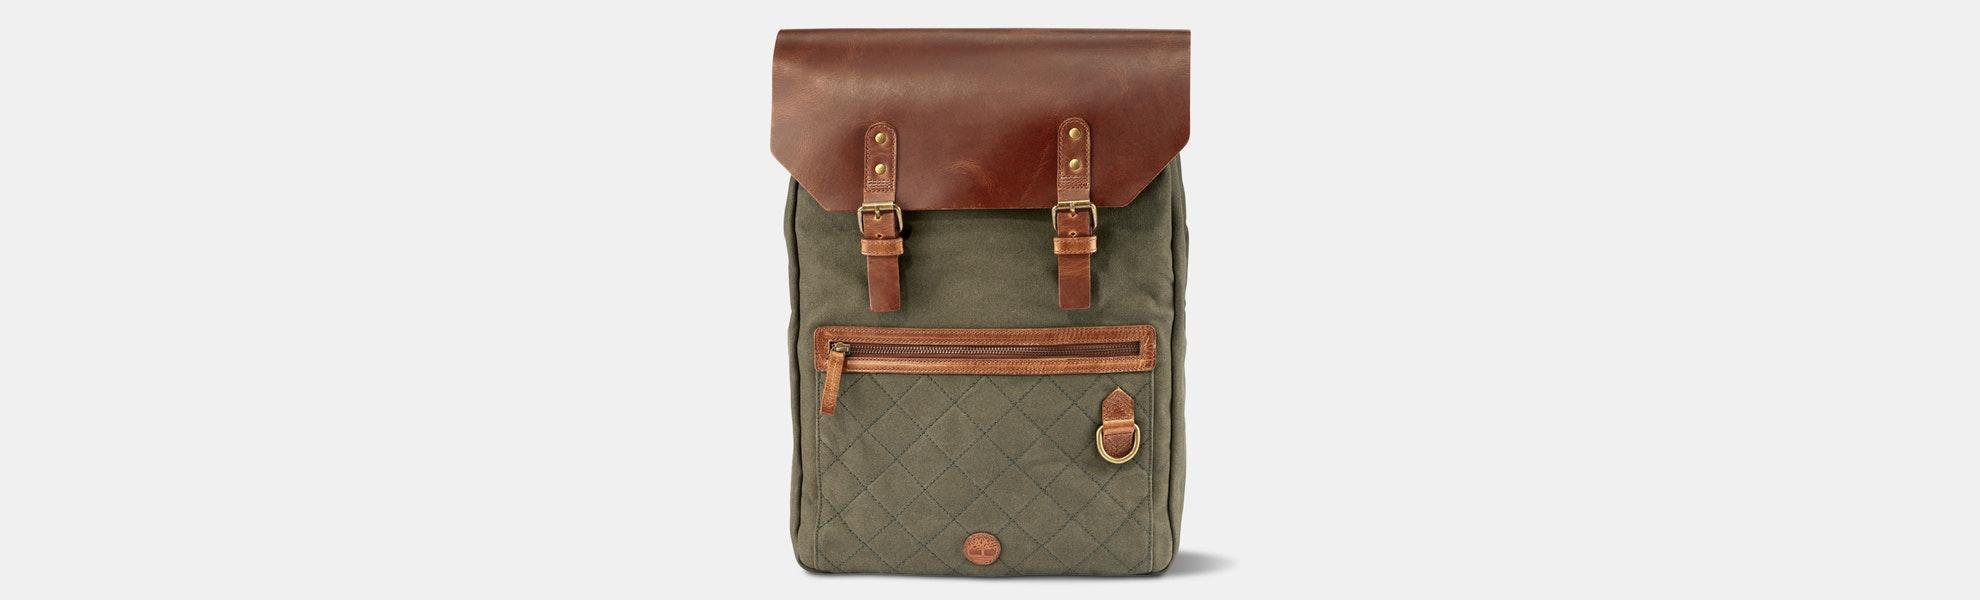 Timberland Nantasket Bags